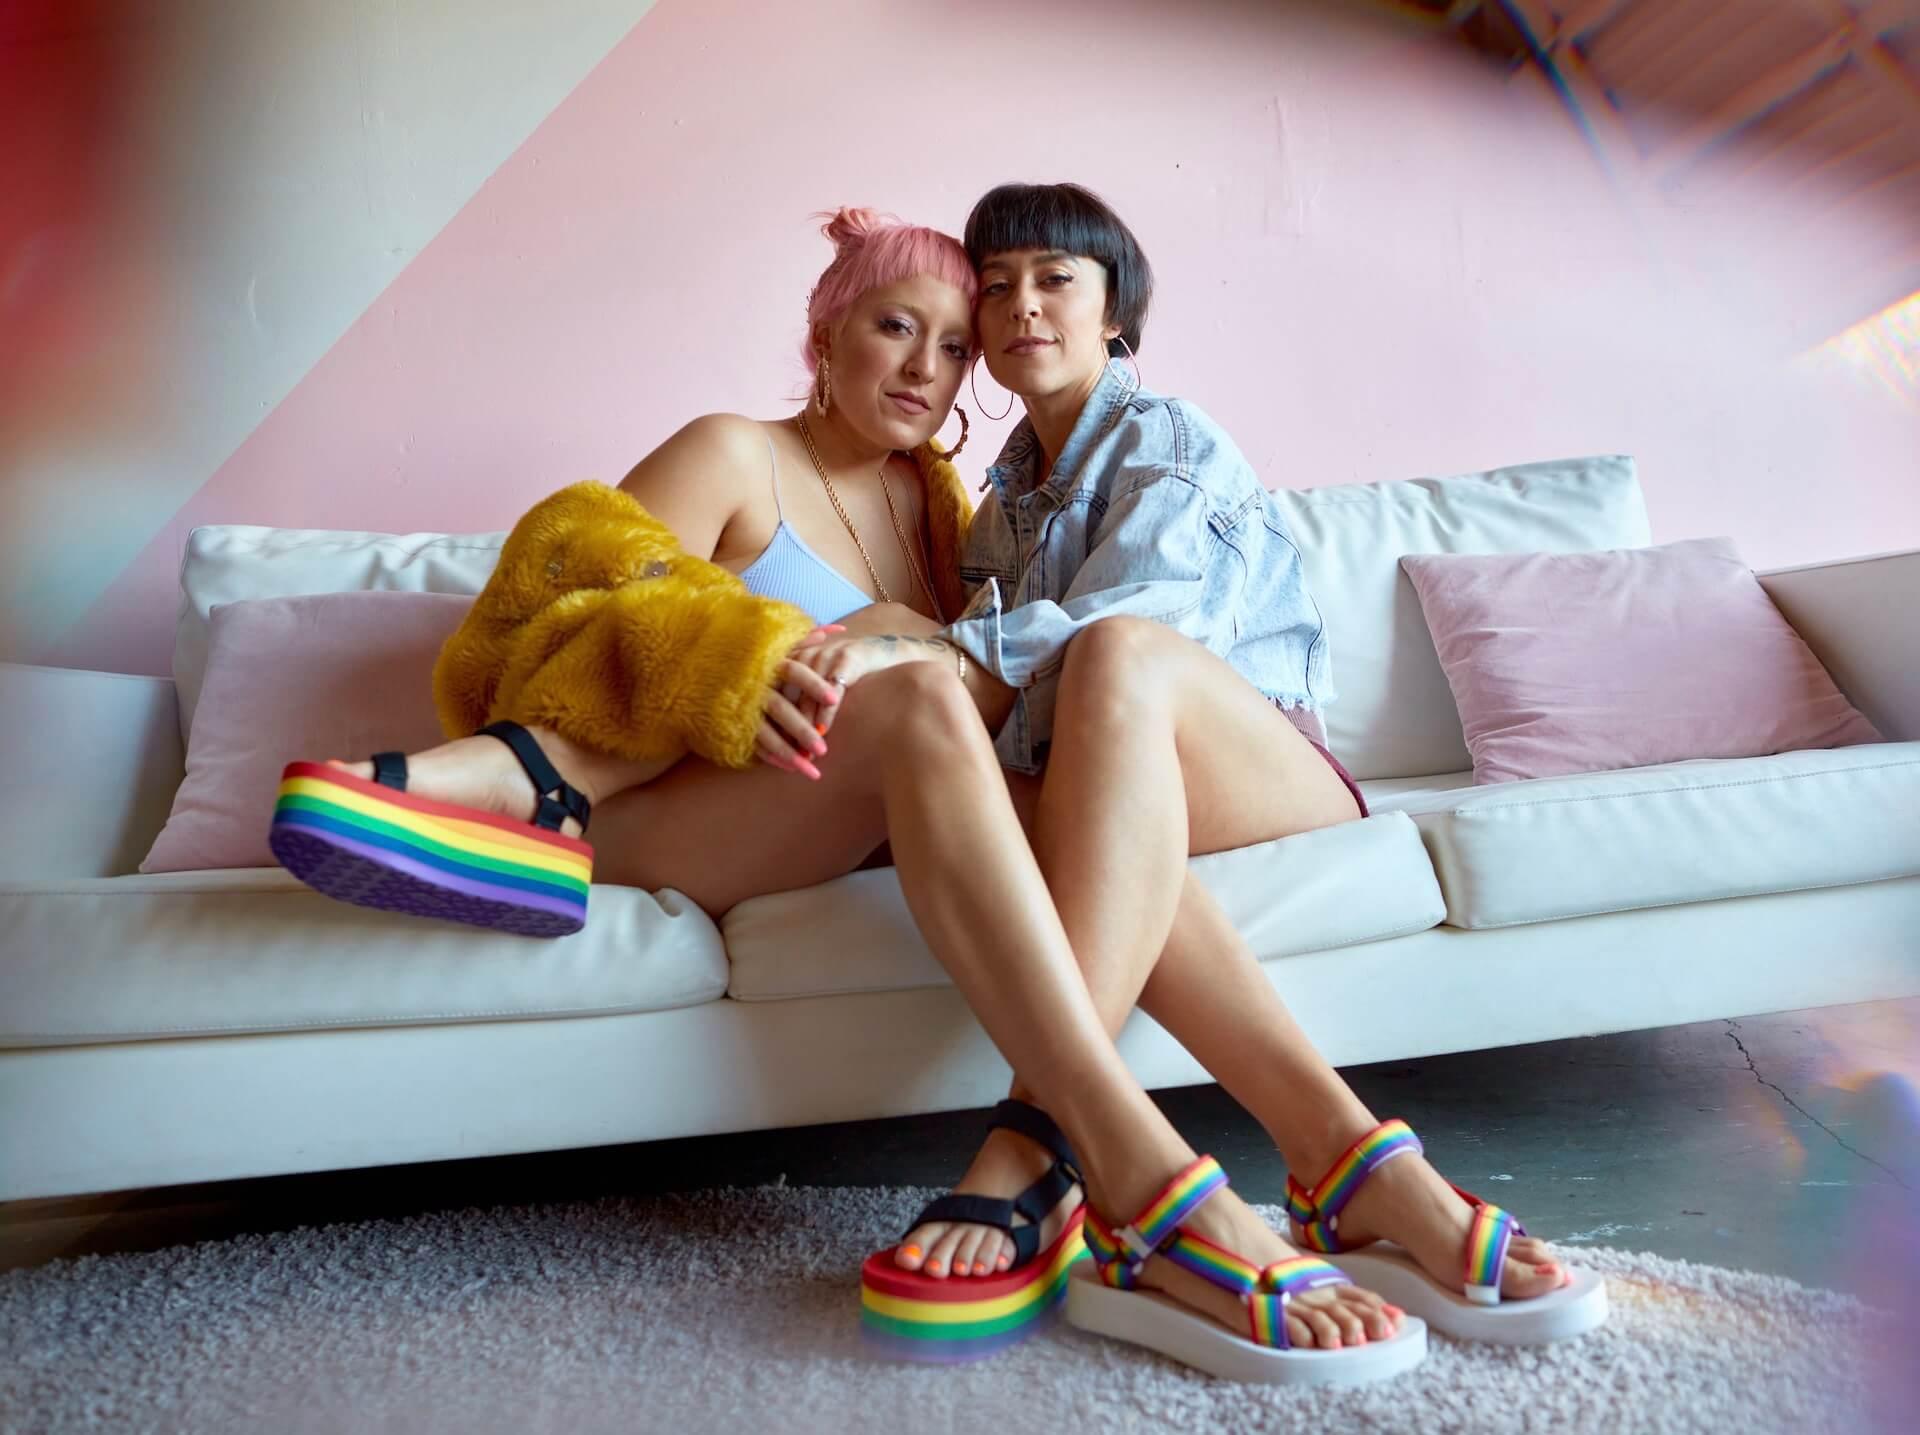 Tevaから、LGBTQ+支援団体「It Gets Better Project」記念サンダル登場!レインボーカラーの2種類 lf200421_teva_universal_02